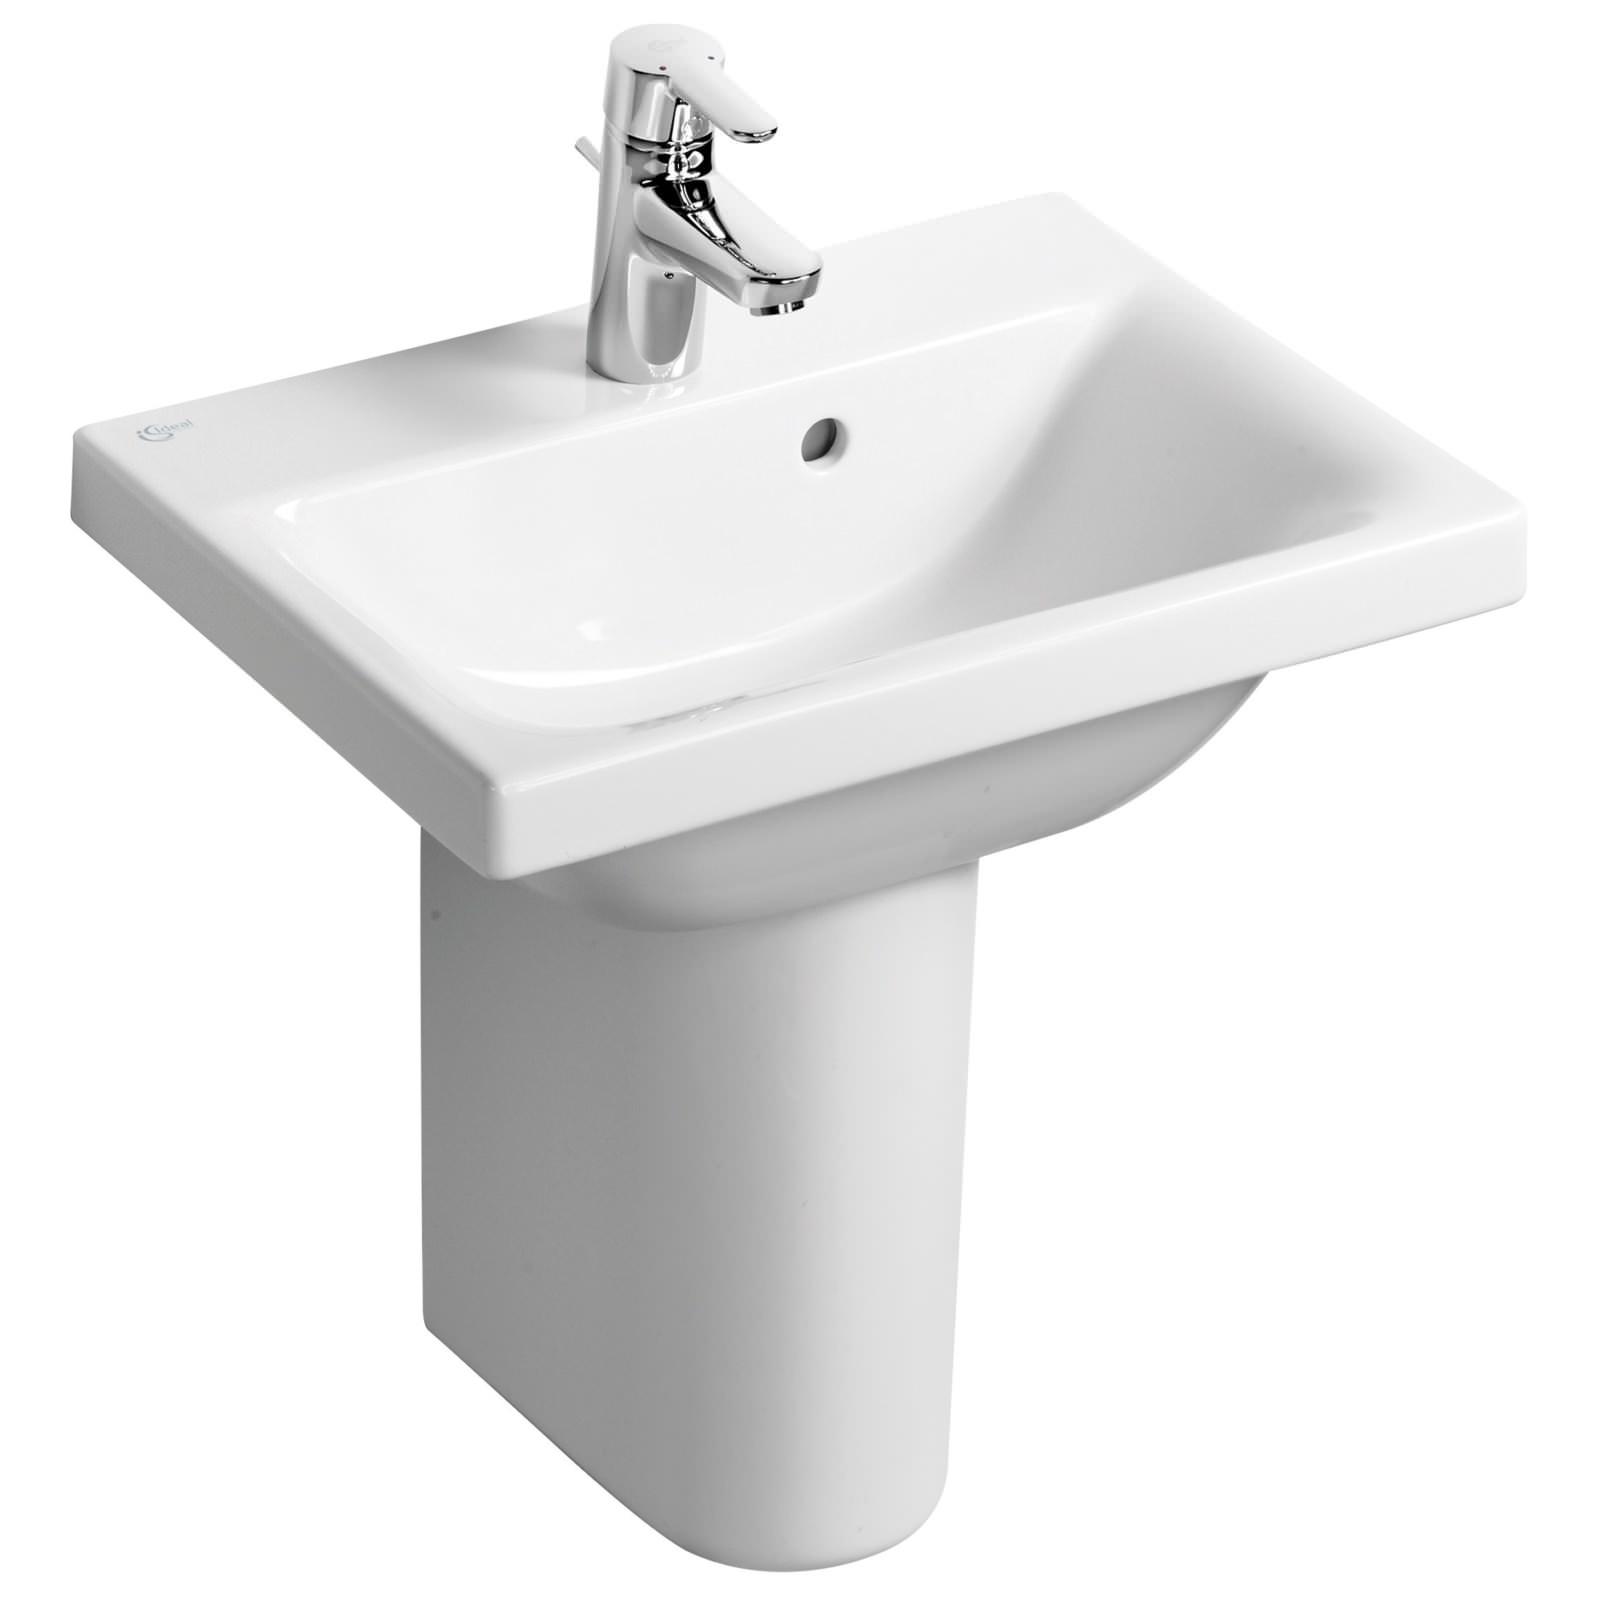 ideal standard concept space 55 x 38cm basin with 1 taphole. Black Bedroom Furniture Sets. Home Design Ideas